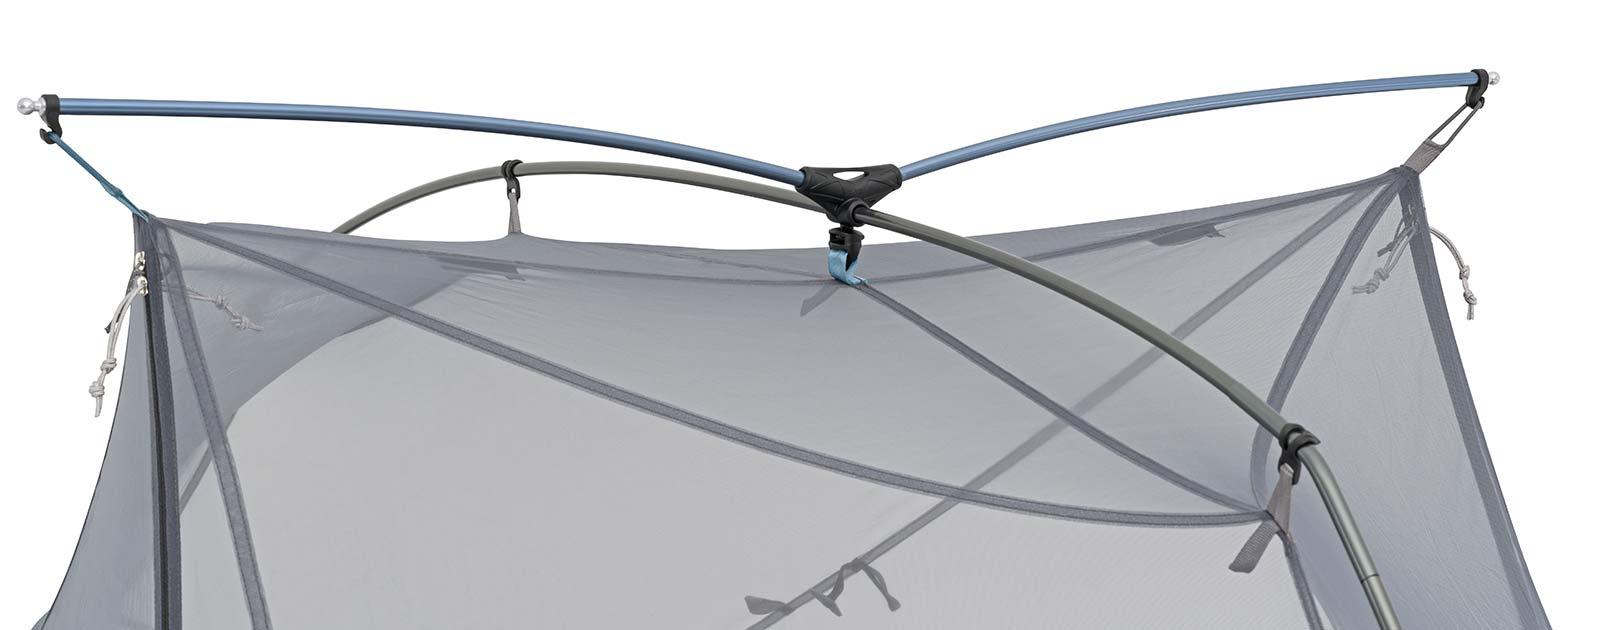 Sea to Summit Alto and Telos TR lightweight tents, Tension Ridge detail